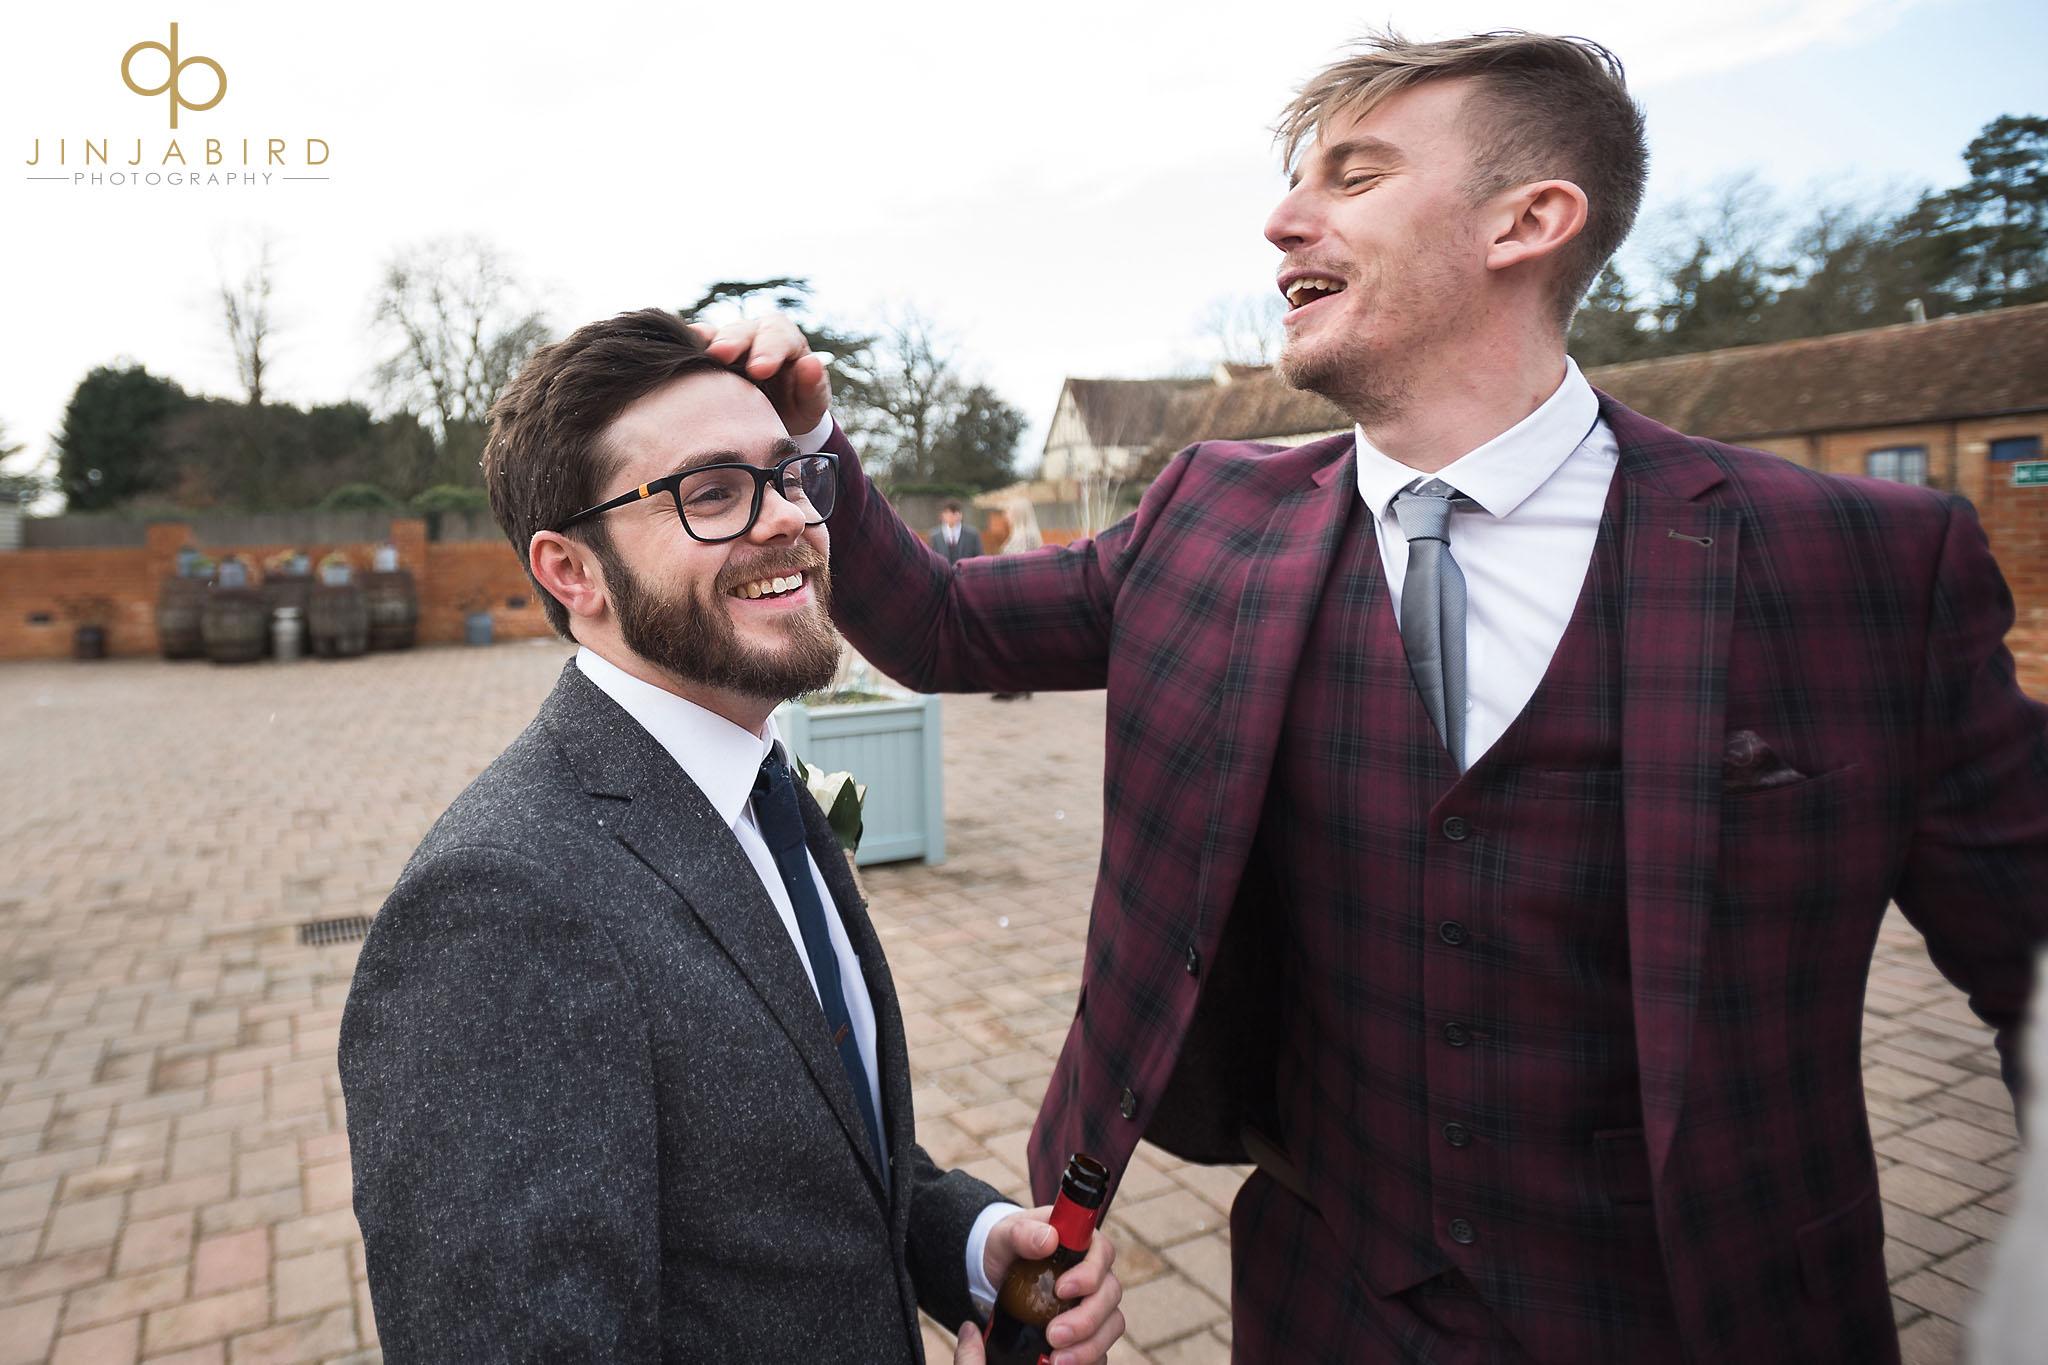 guest joking with groom